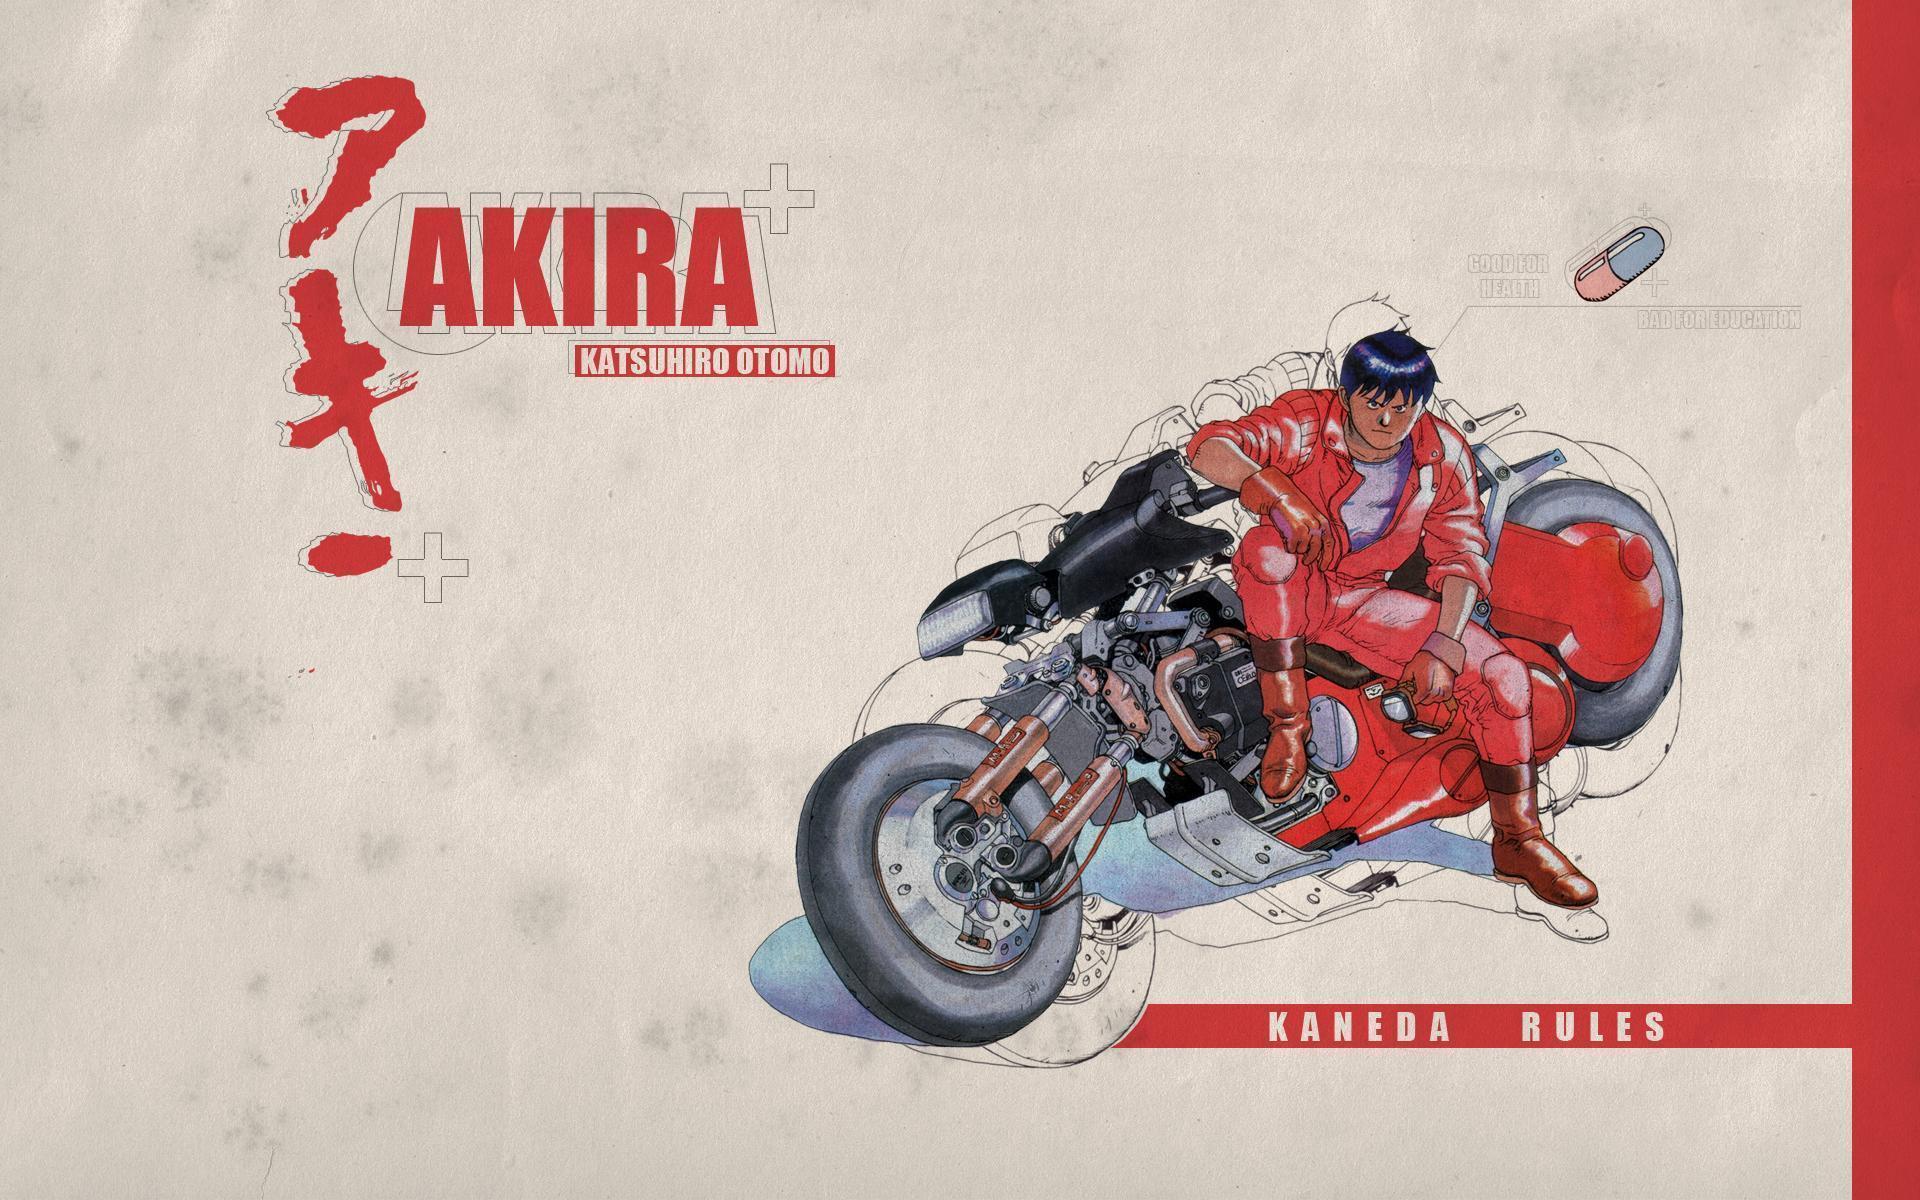 akira wallpaper 4